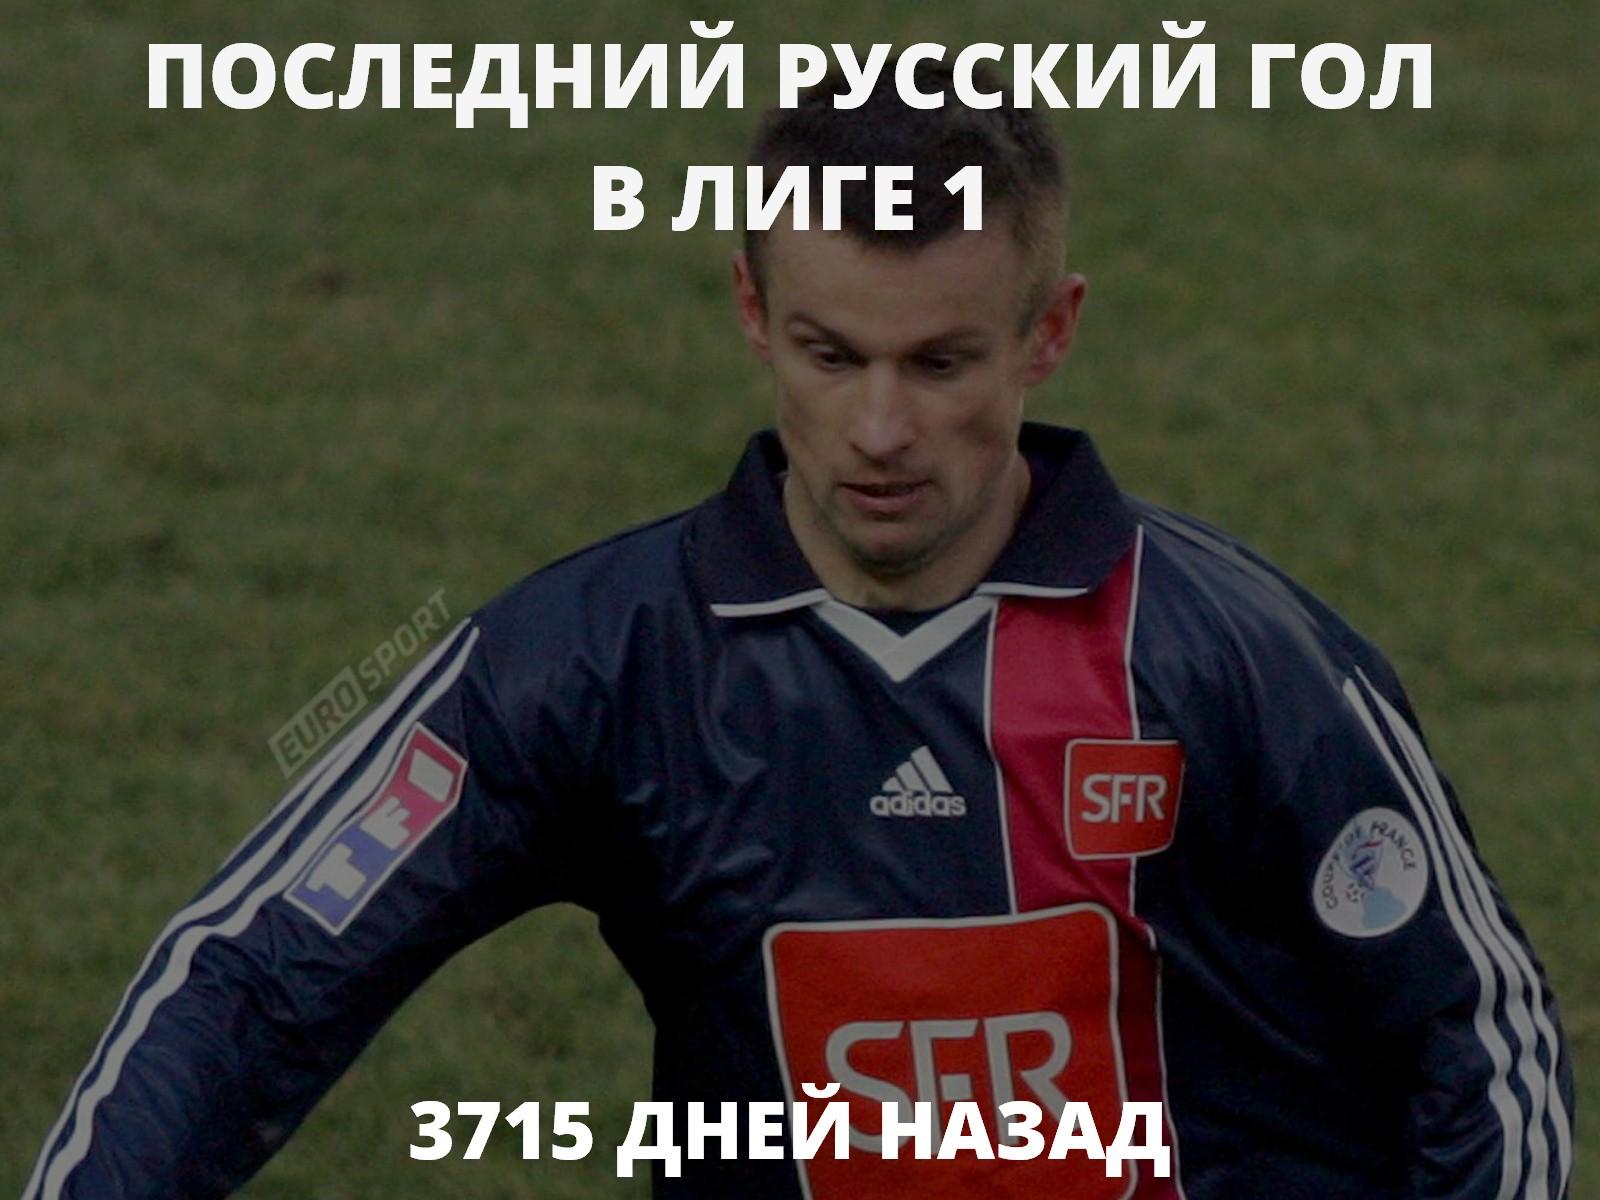 Фото как русские забивают гол фото 587-462